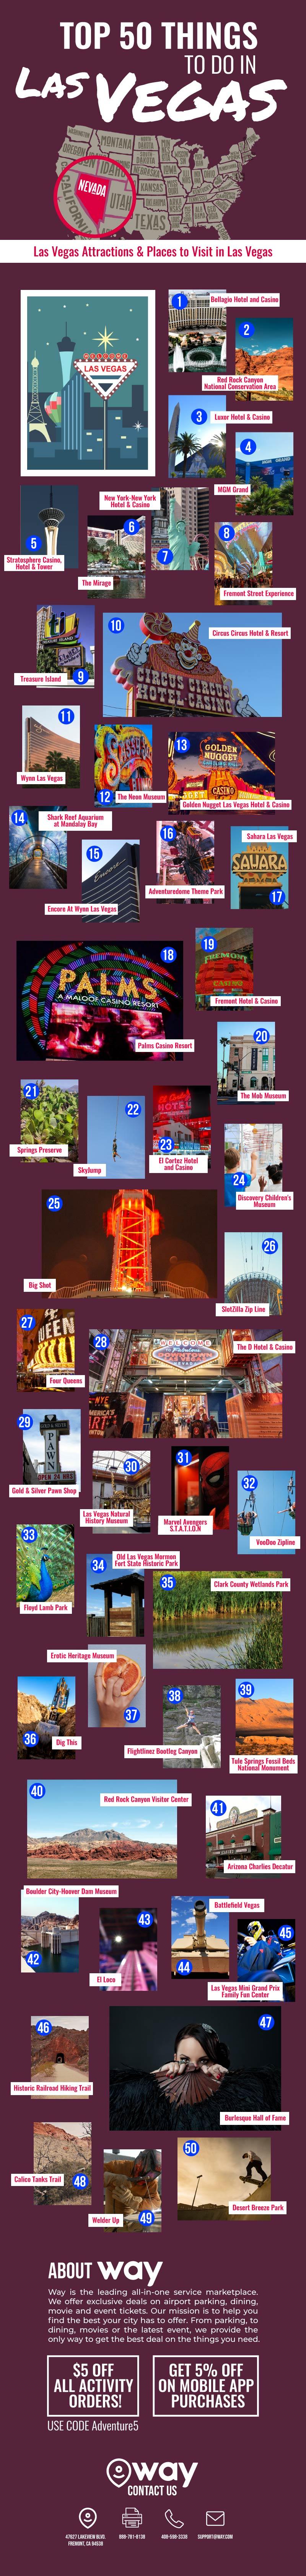 Top 50 Things to Do in Las Vegas